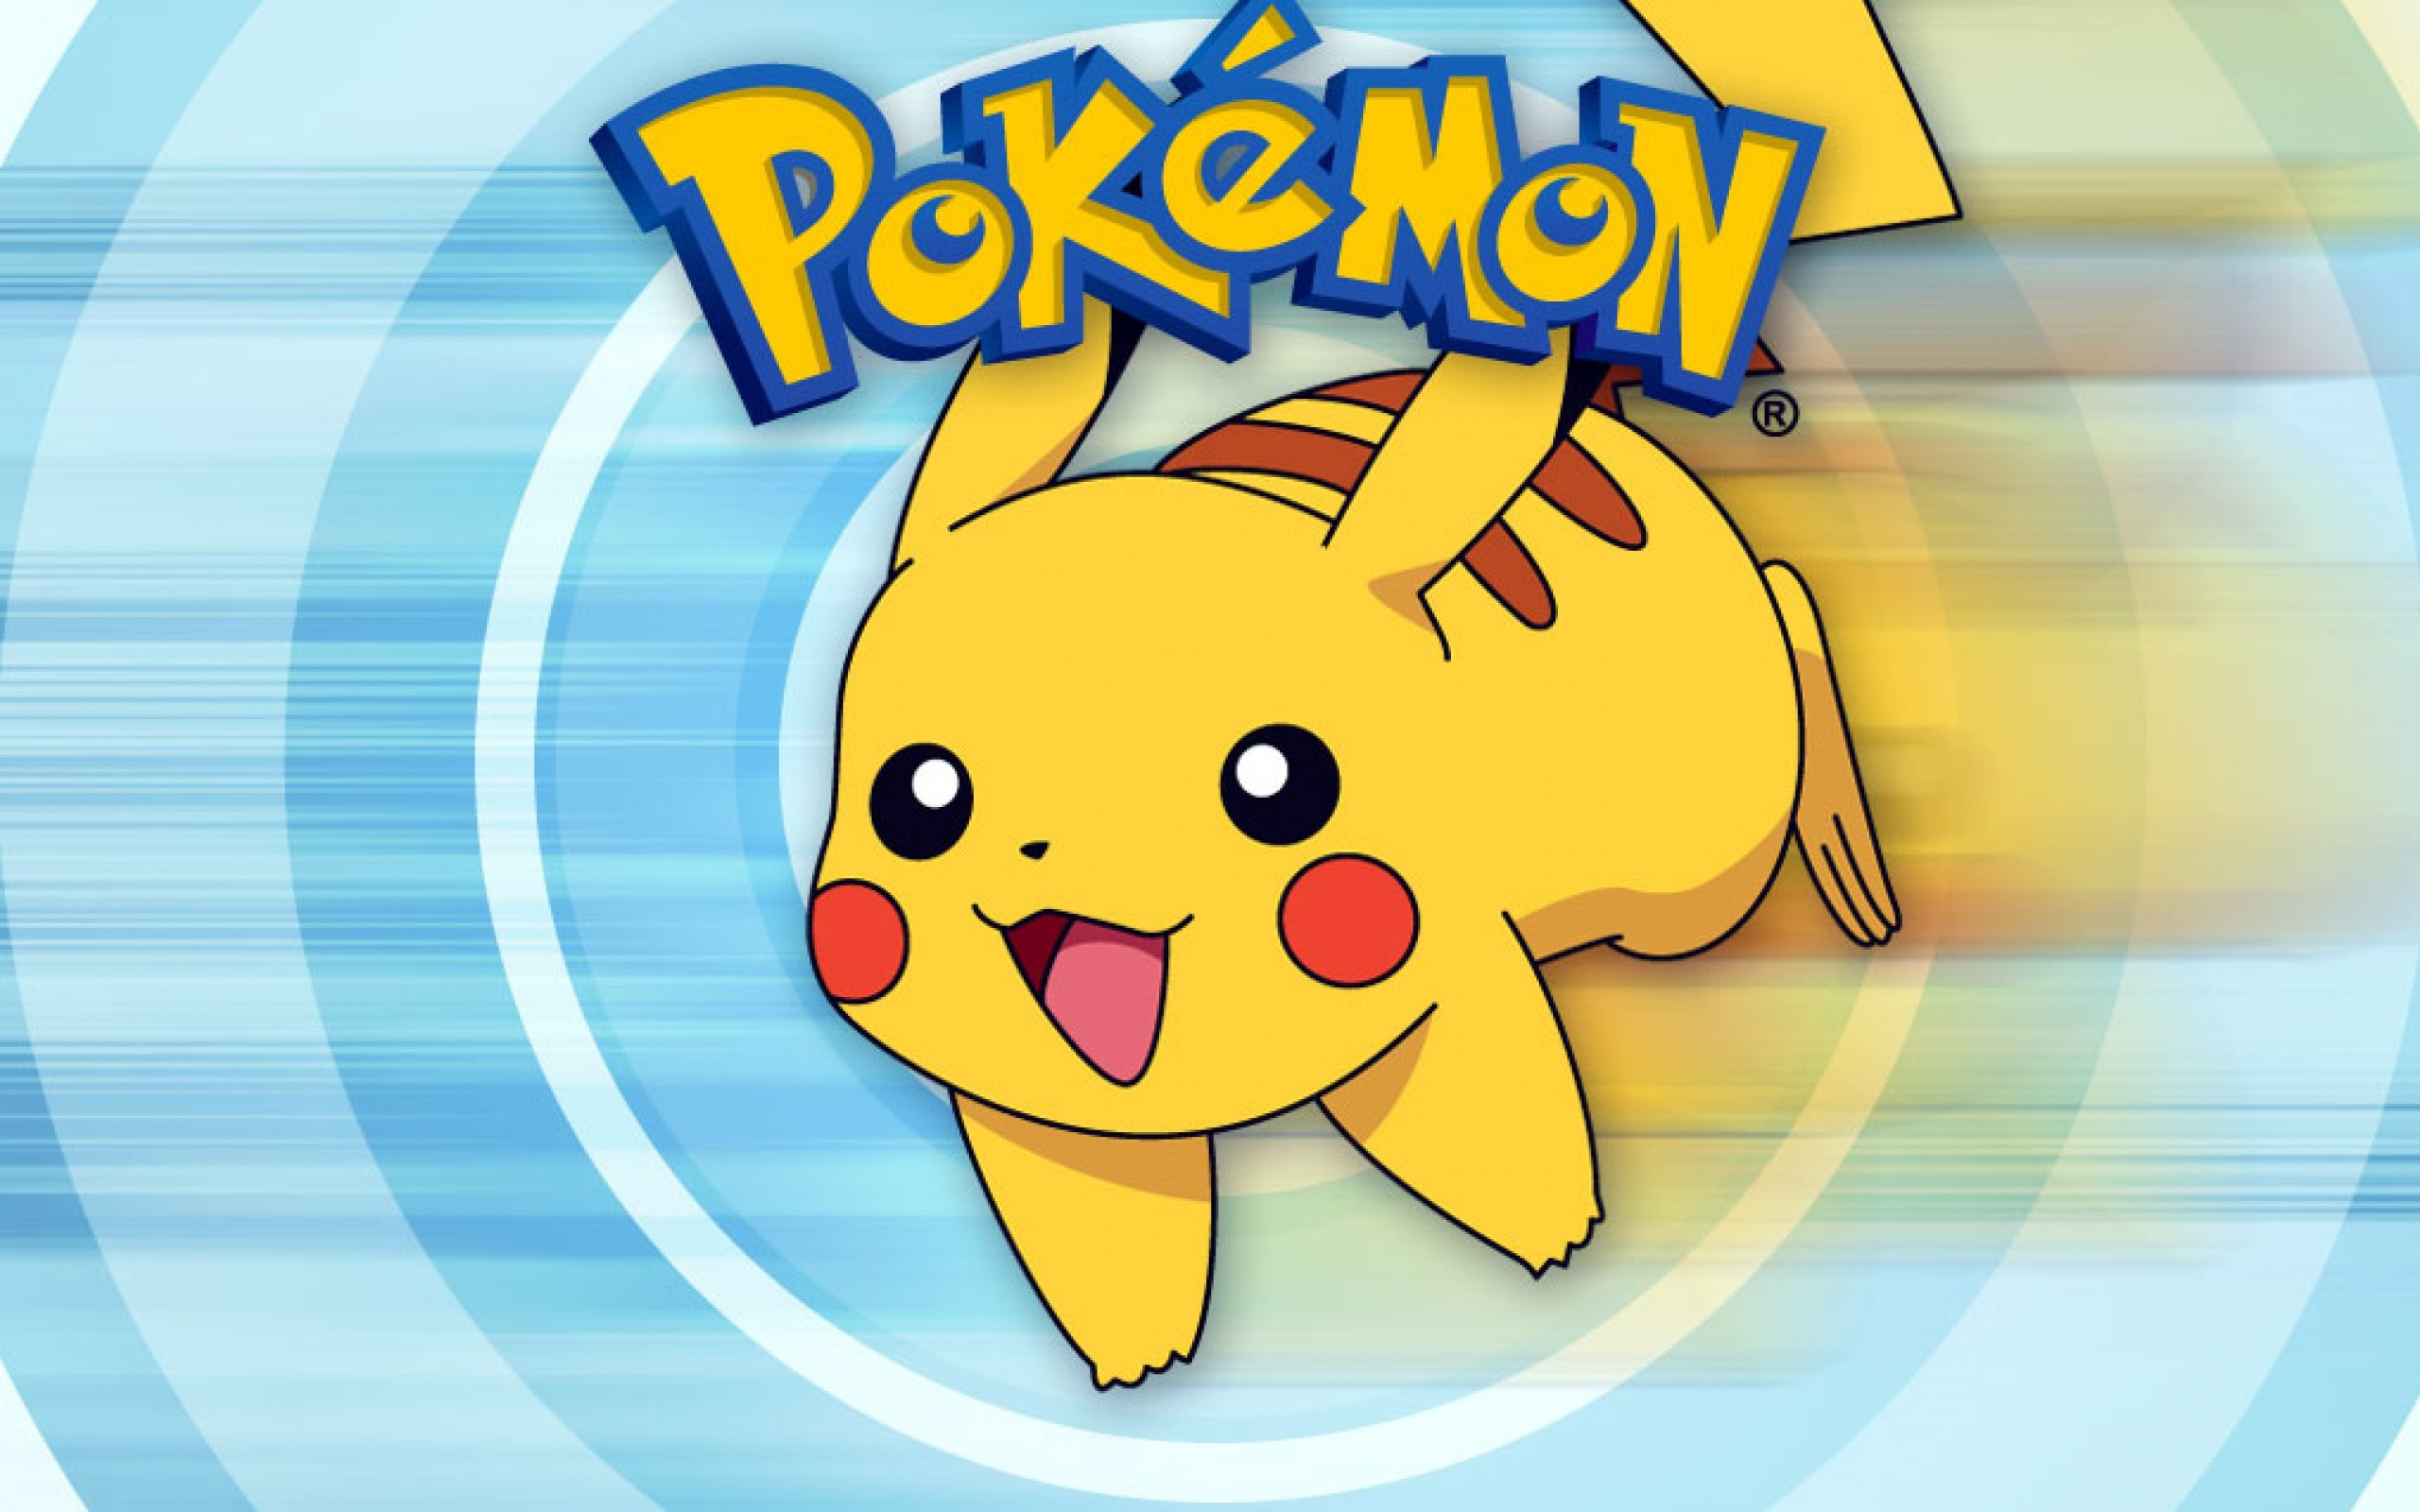 Pokemon Pikachu Wallpapers ·① WallpaperTag